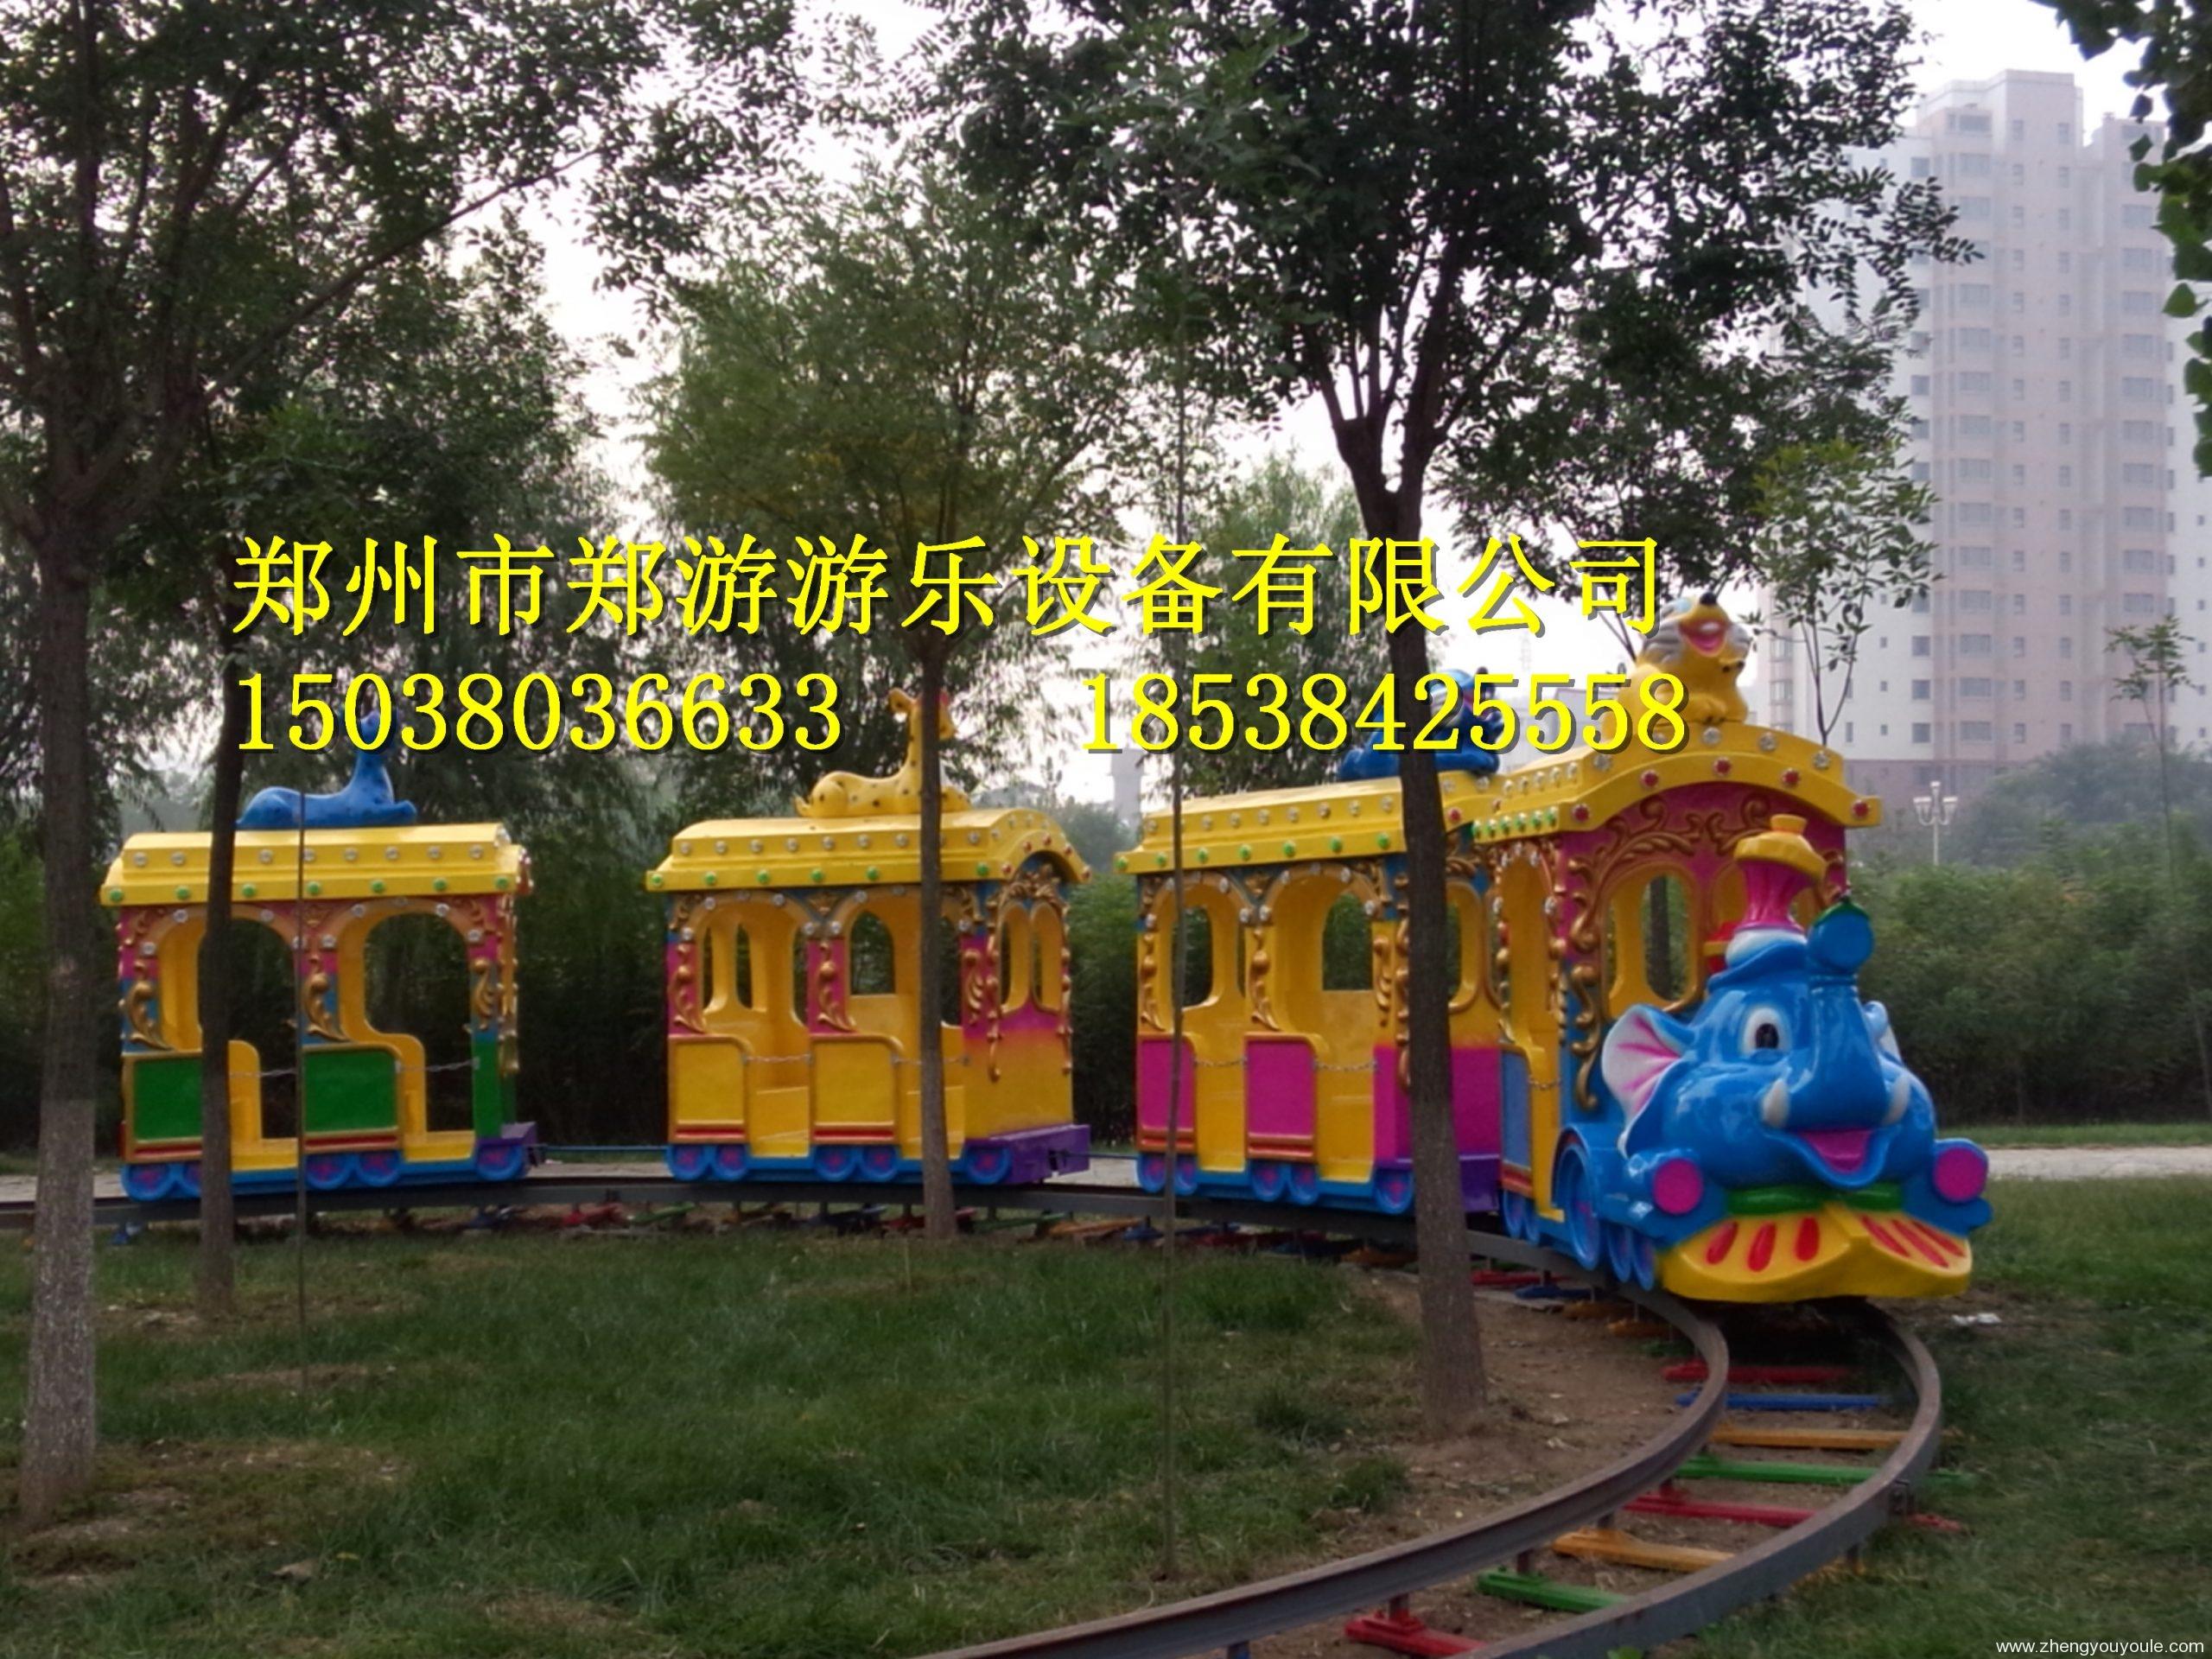 2020030611473877 scaled - 轨道类—轨道火车